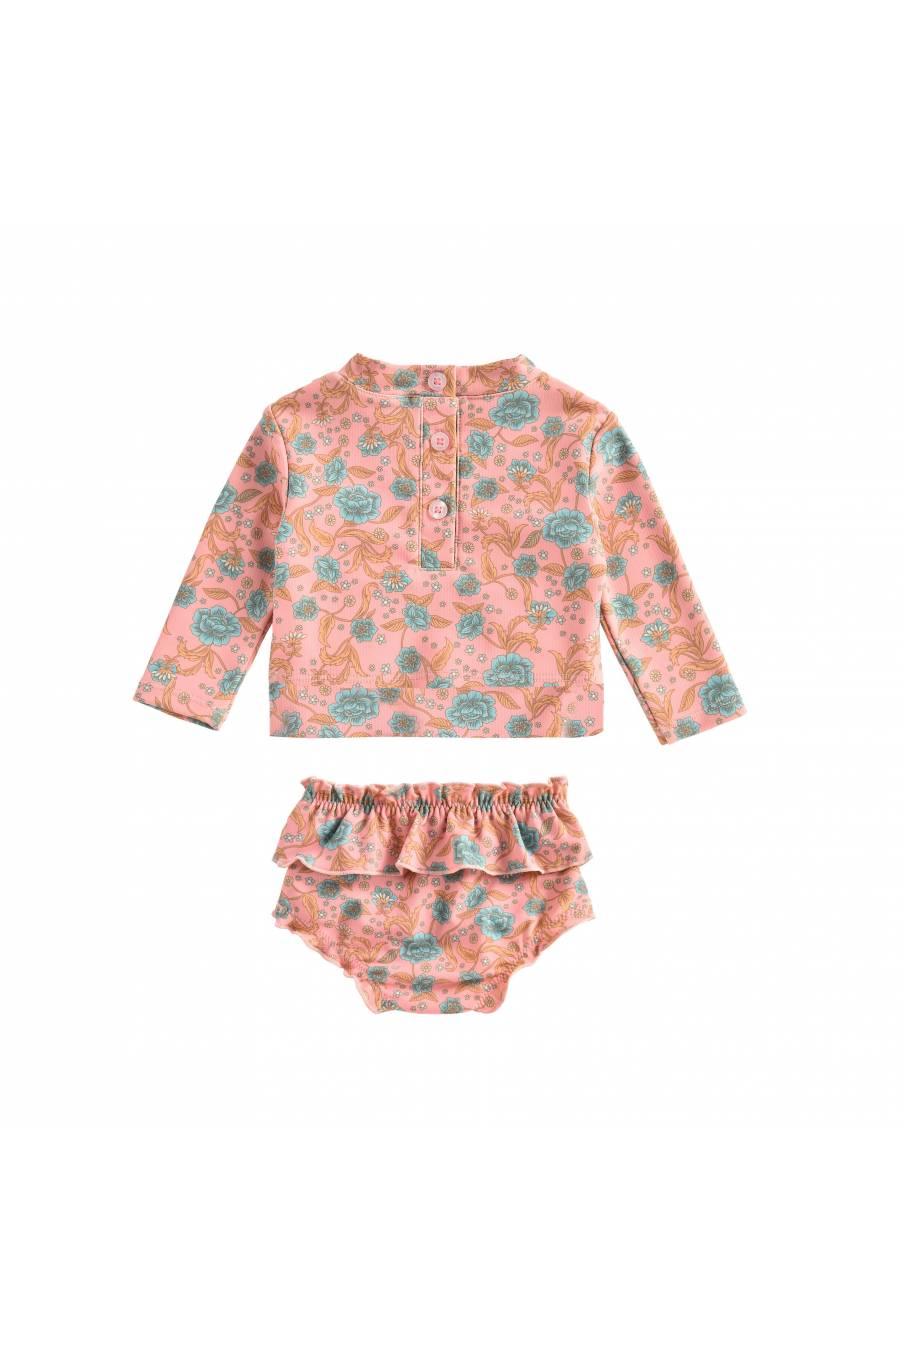 bathing suit bohème chic vintage  bebe fille fleurie toluca